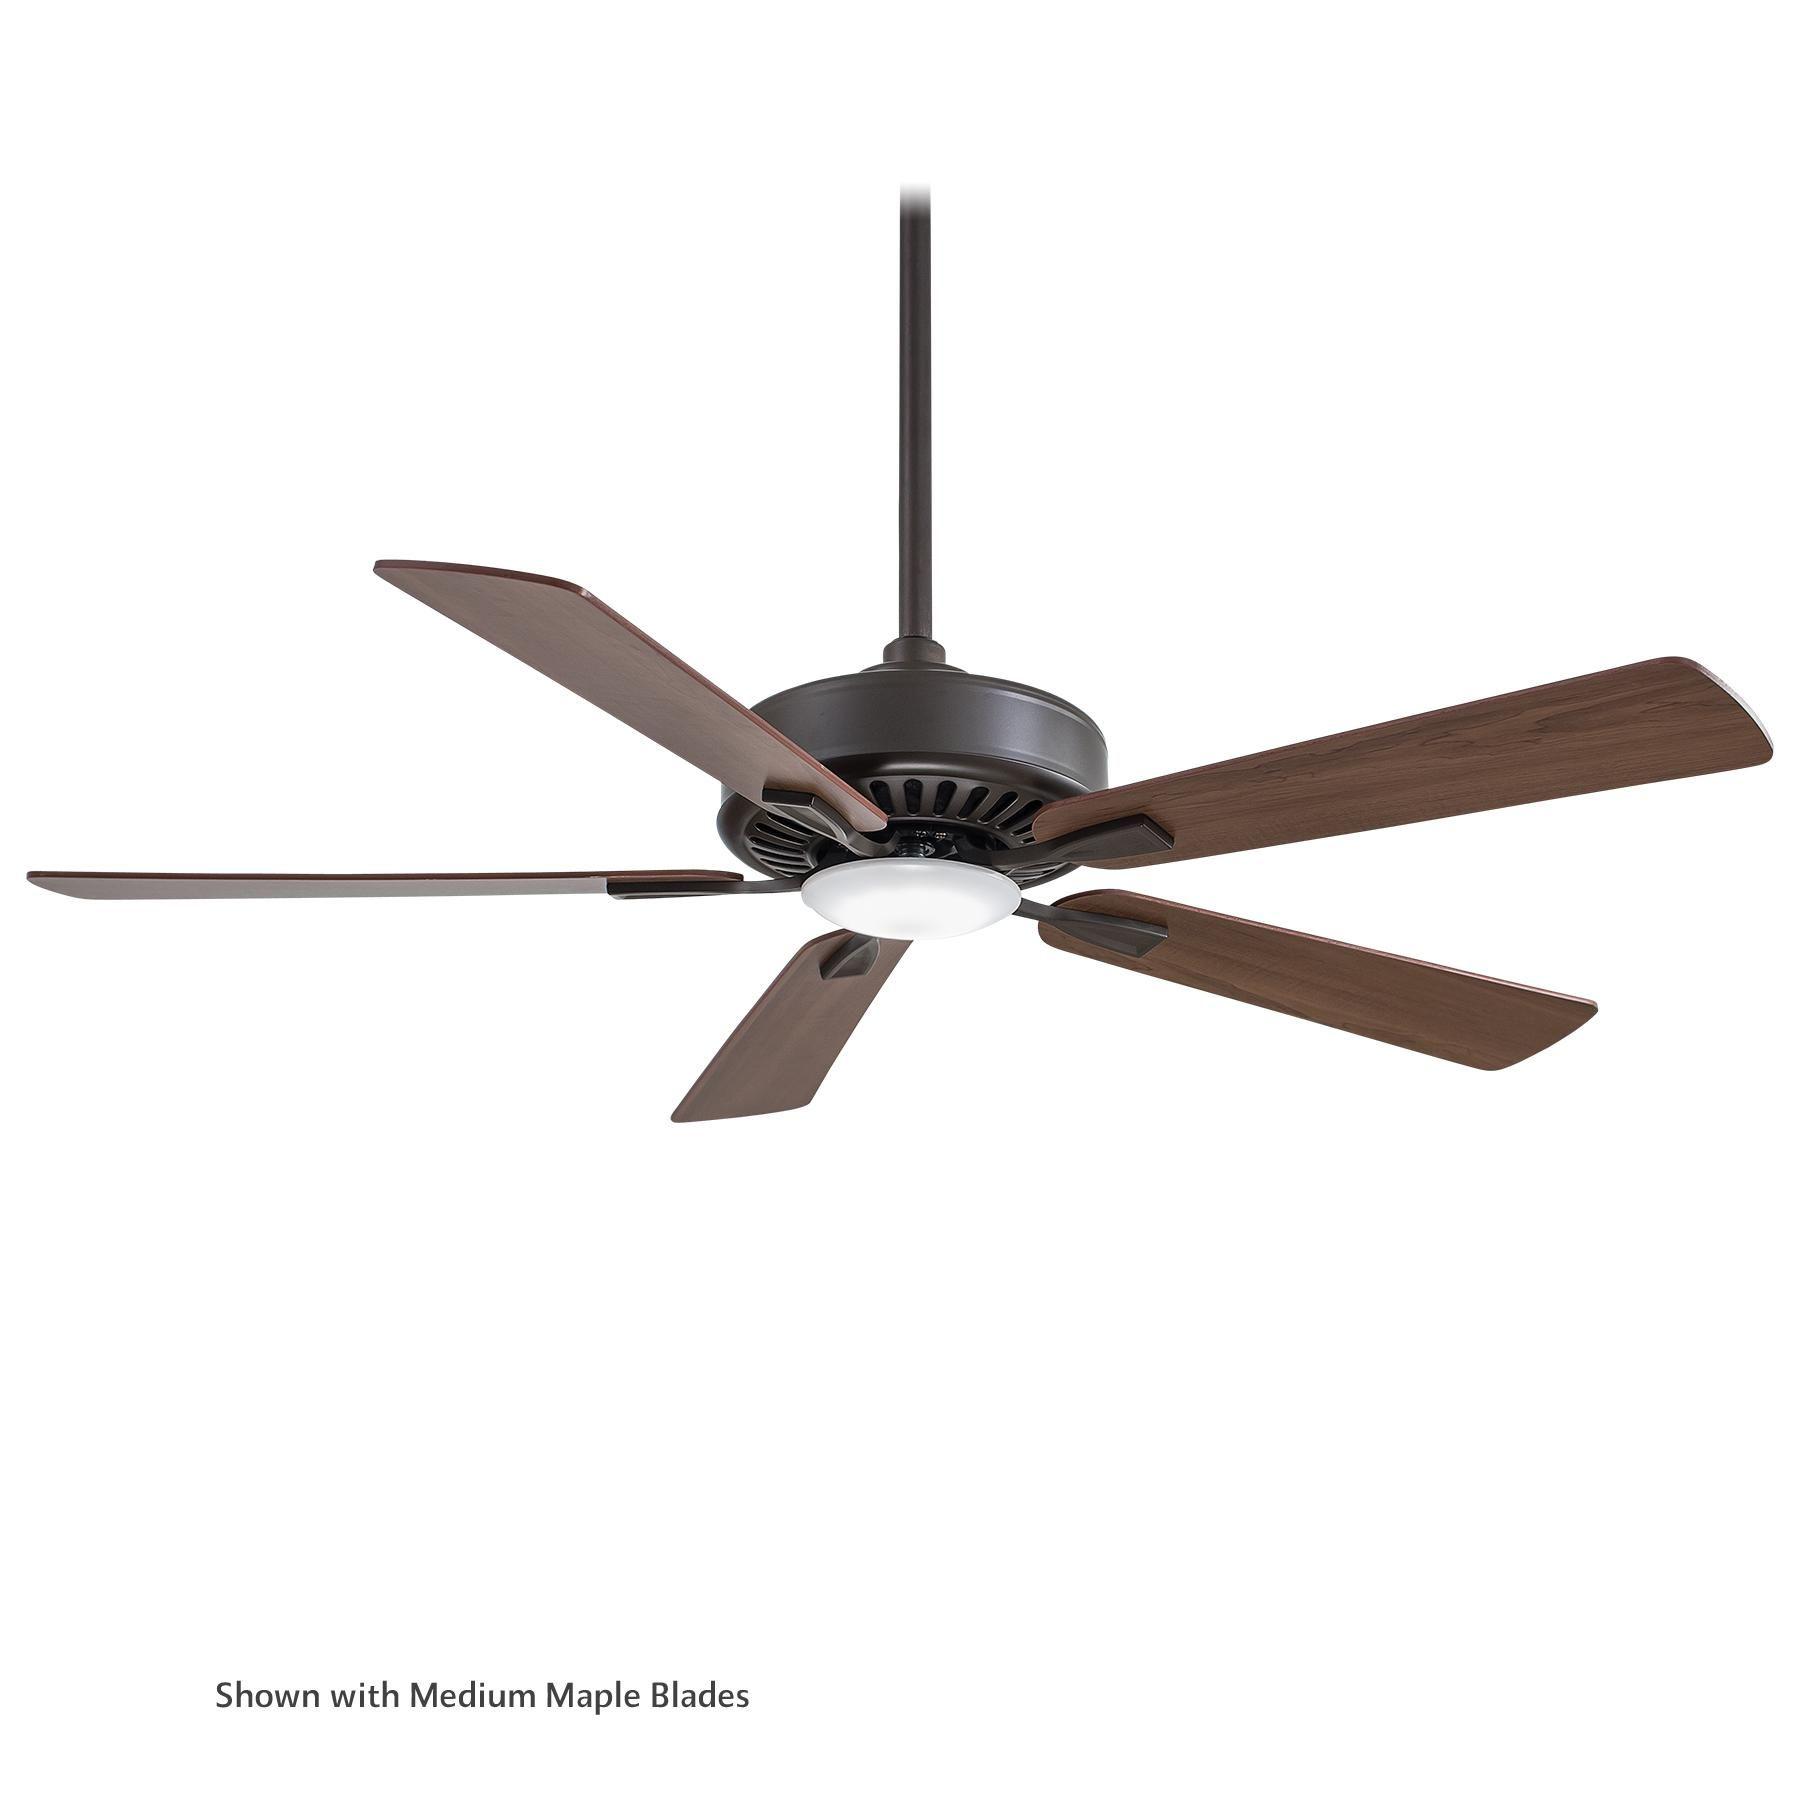 "MinkaAire F556L BN Brushed Nickel 52"" 5 Blade Indoor Ceiling Fan"